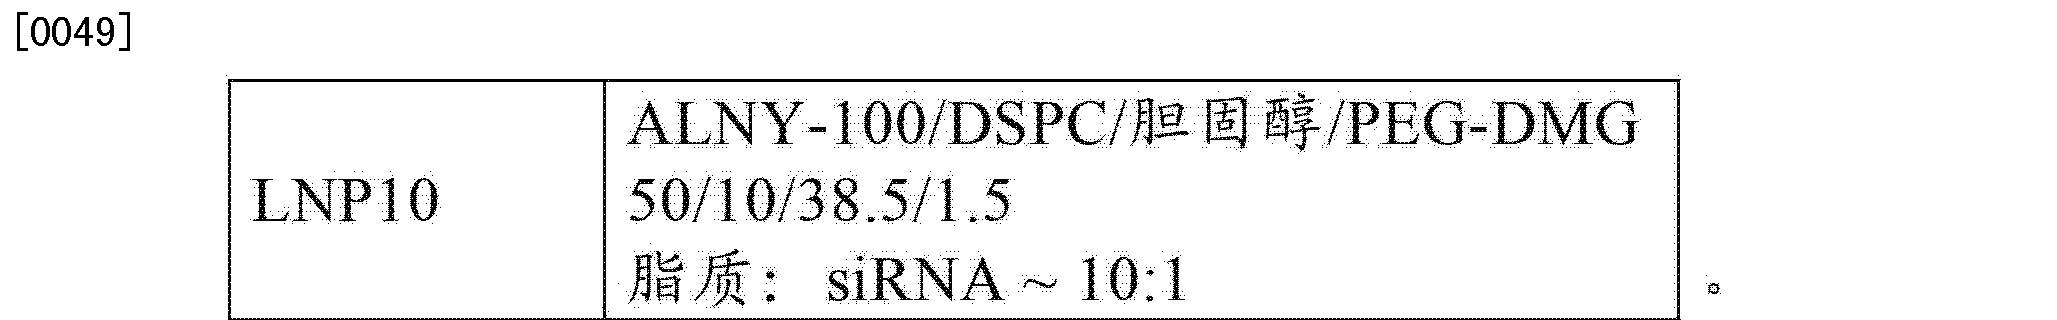 Figure CN104922699AD00122